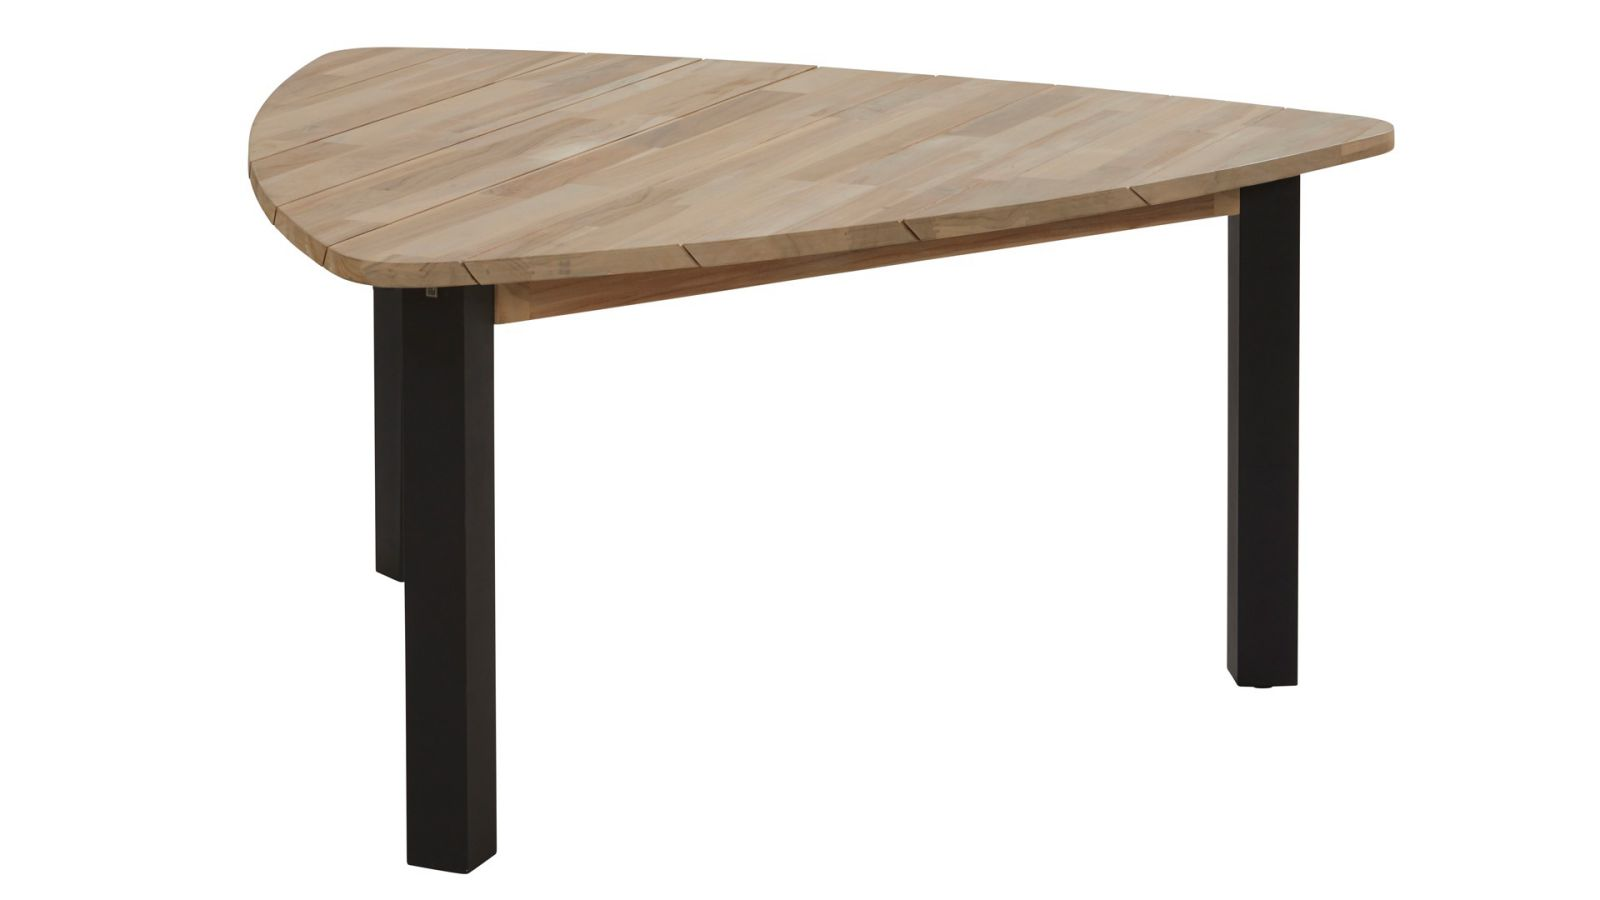 4 seasons outdoor coruna dining set met derby triangle tafel teak sale latour. Black Bedroom Furniture Sets. Home Design Ideas